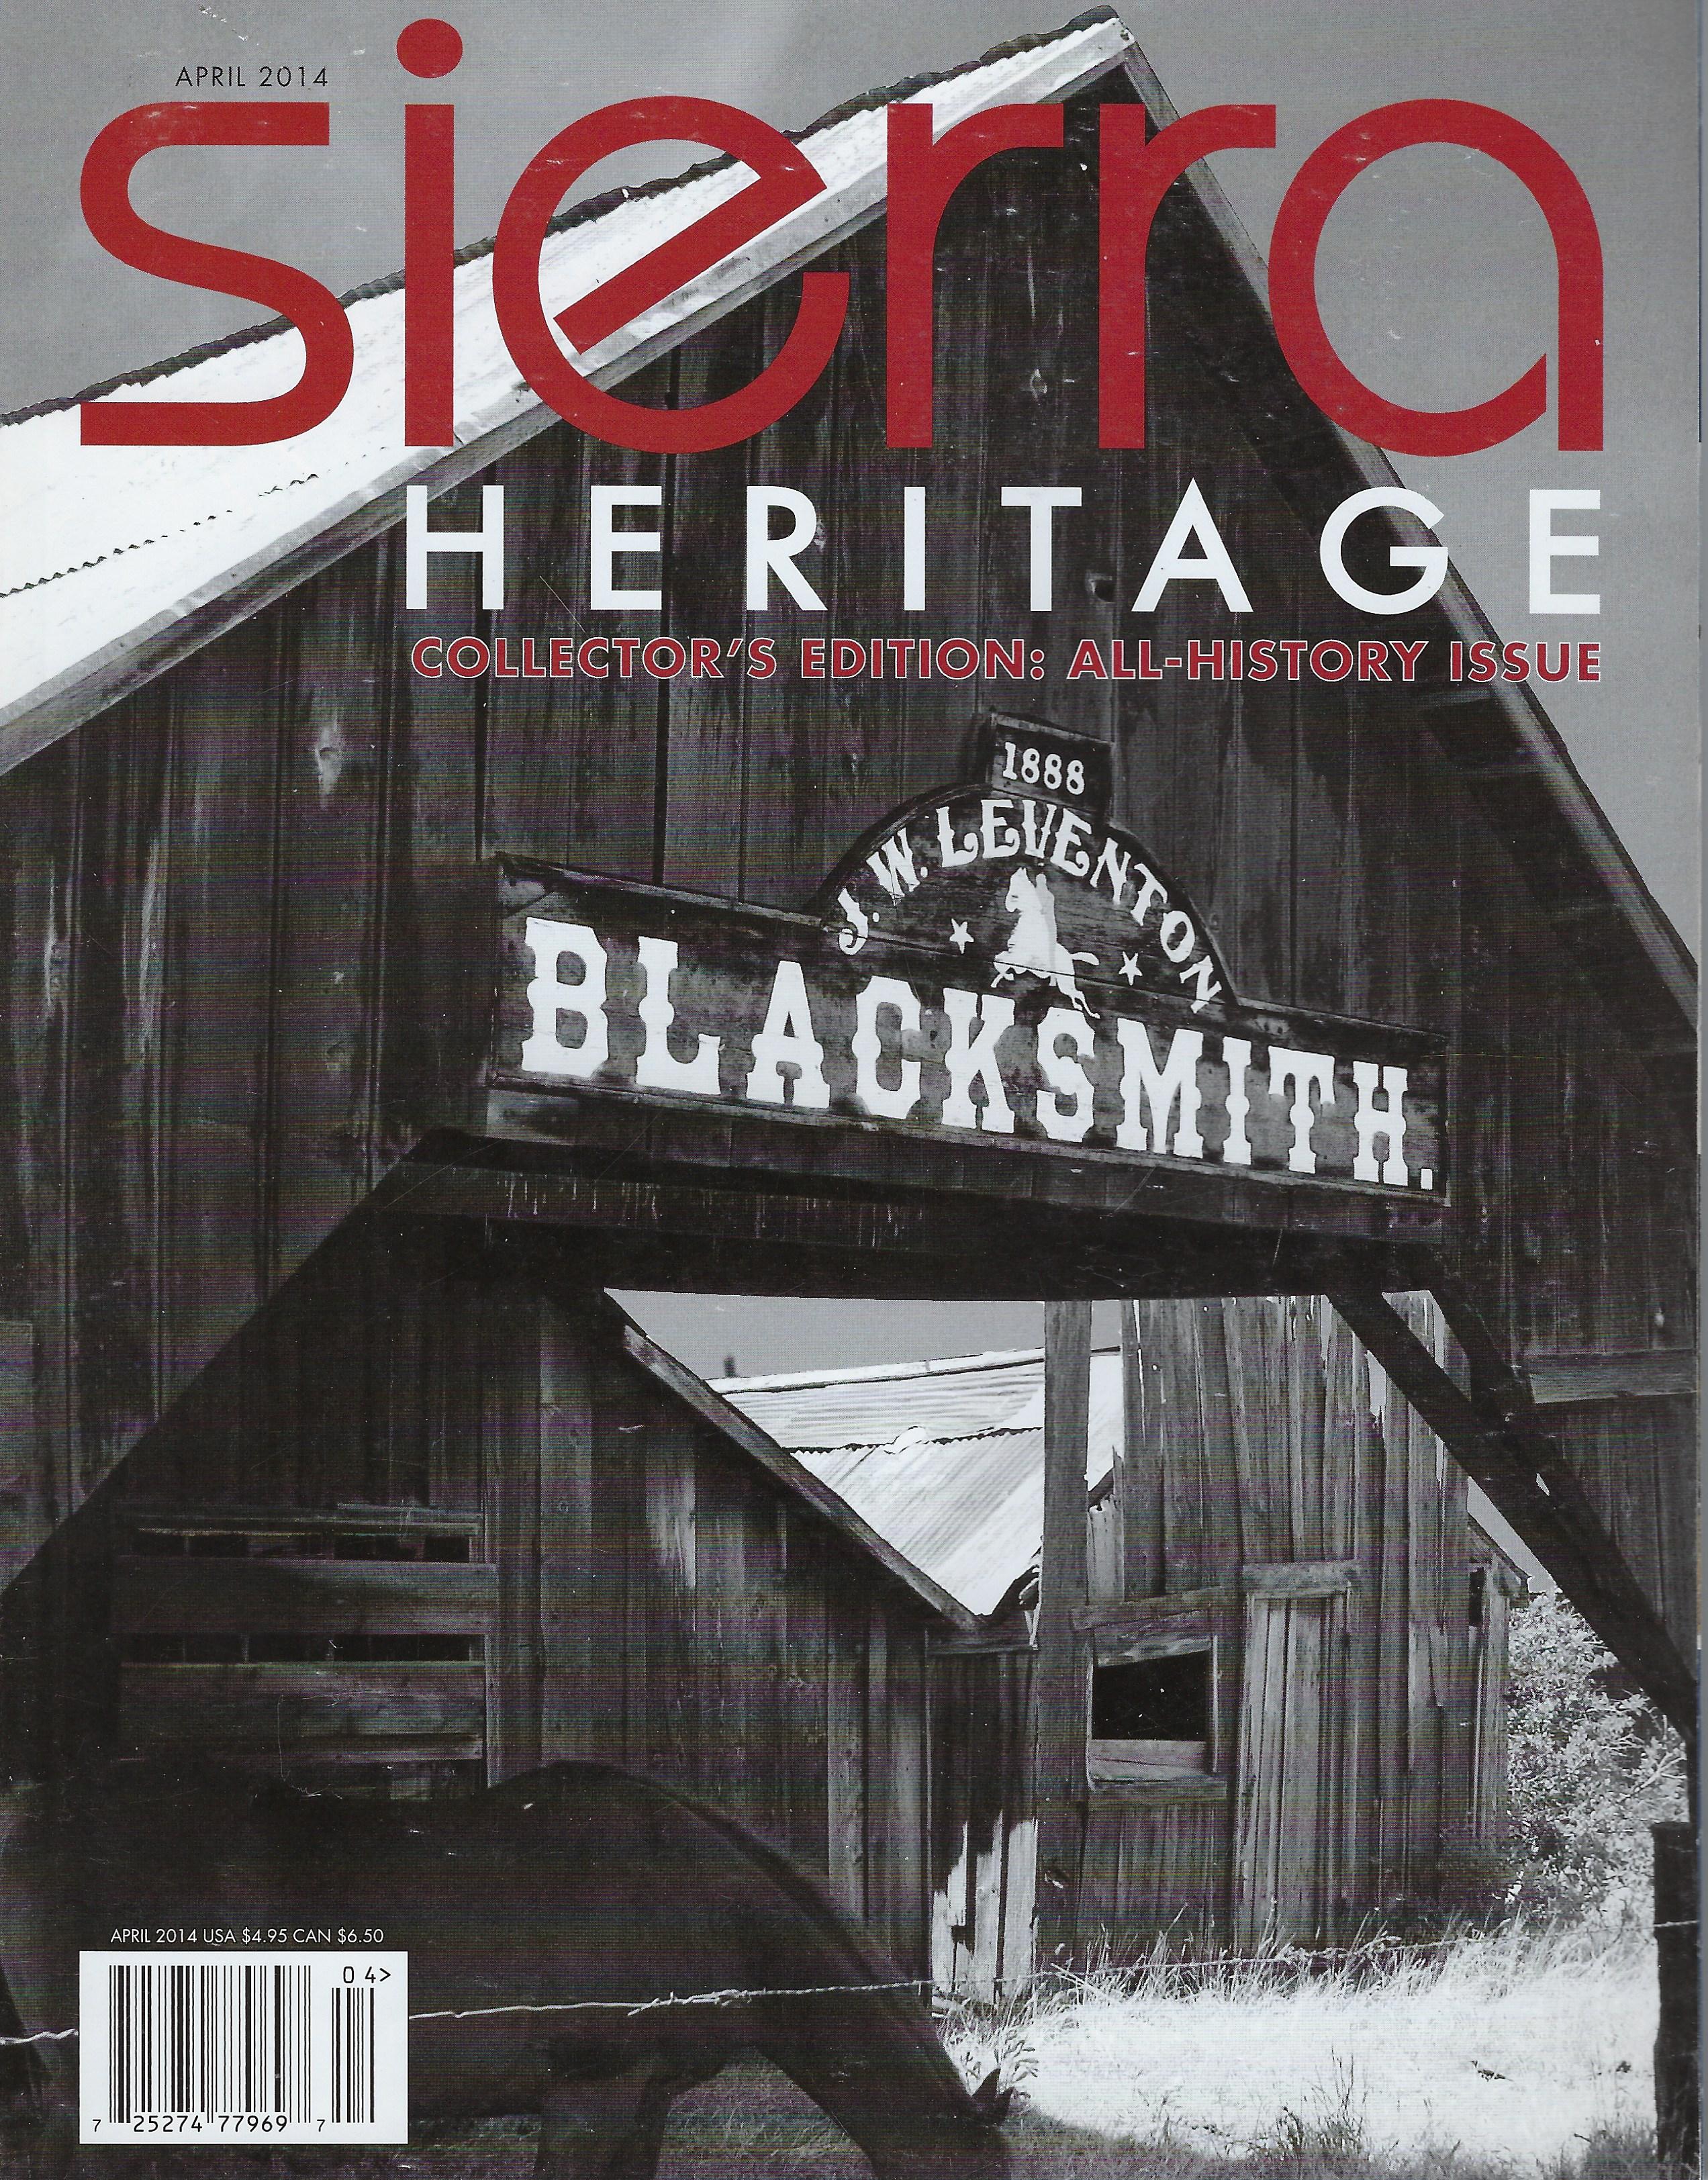 sierra_heritage_cover_april_2014